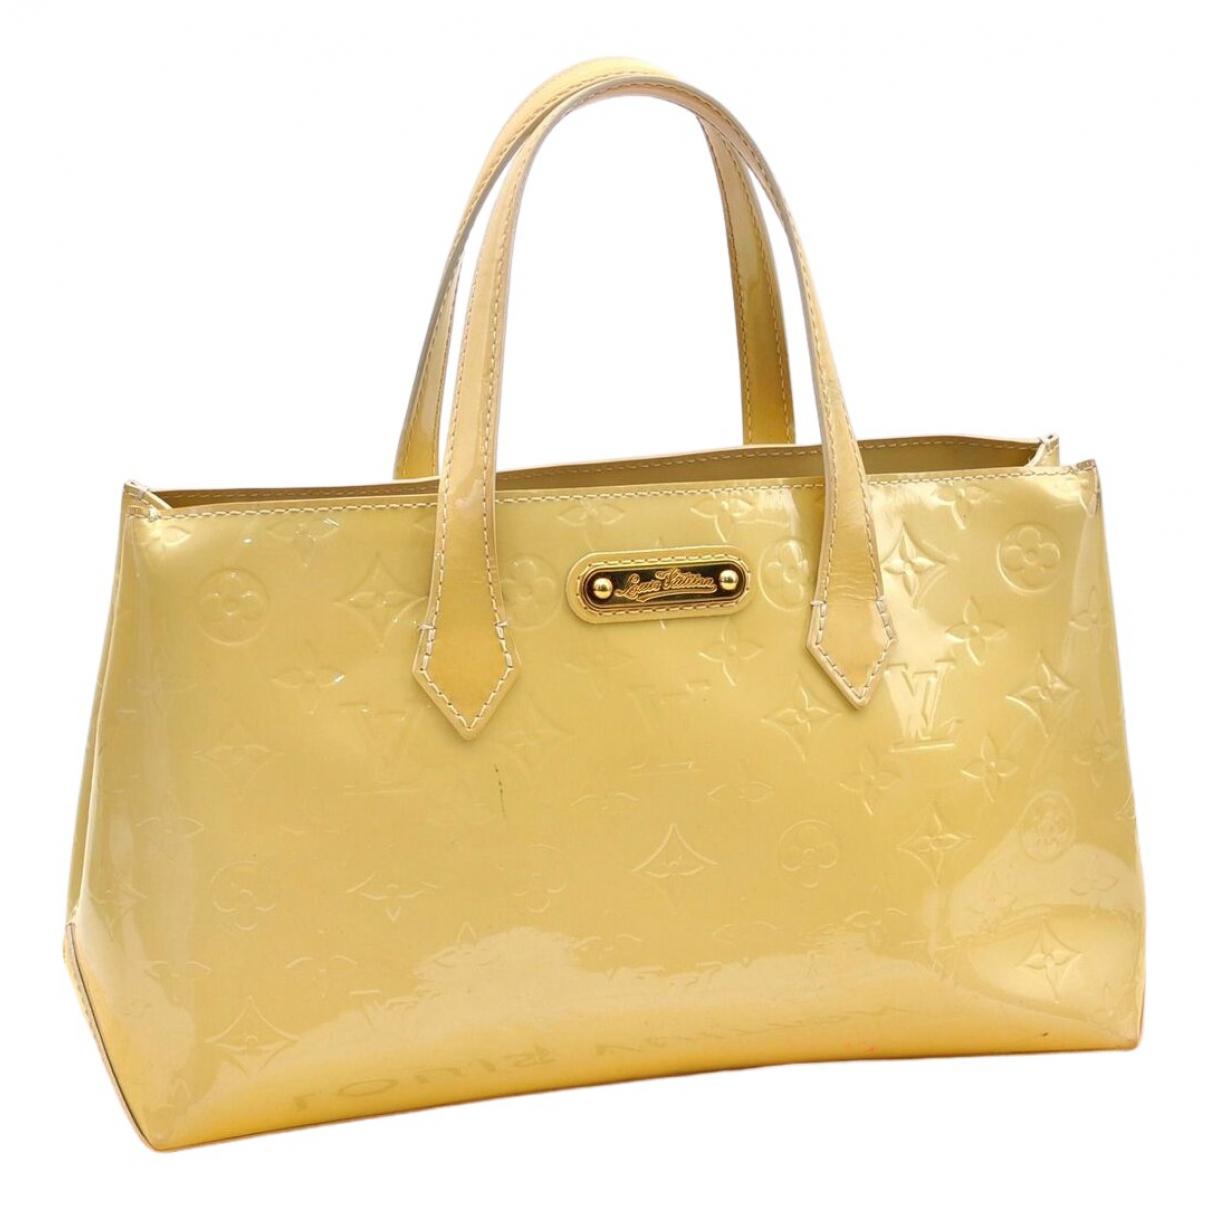 Louis Vuitton \N Yellow Patent leather handbag for Women \N